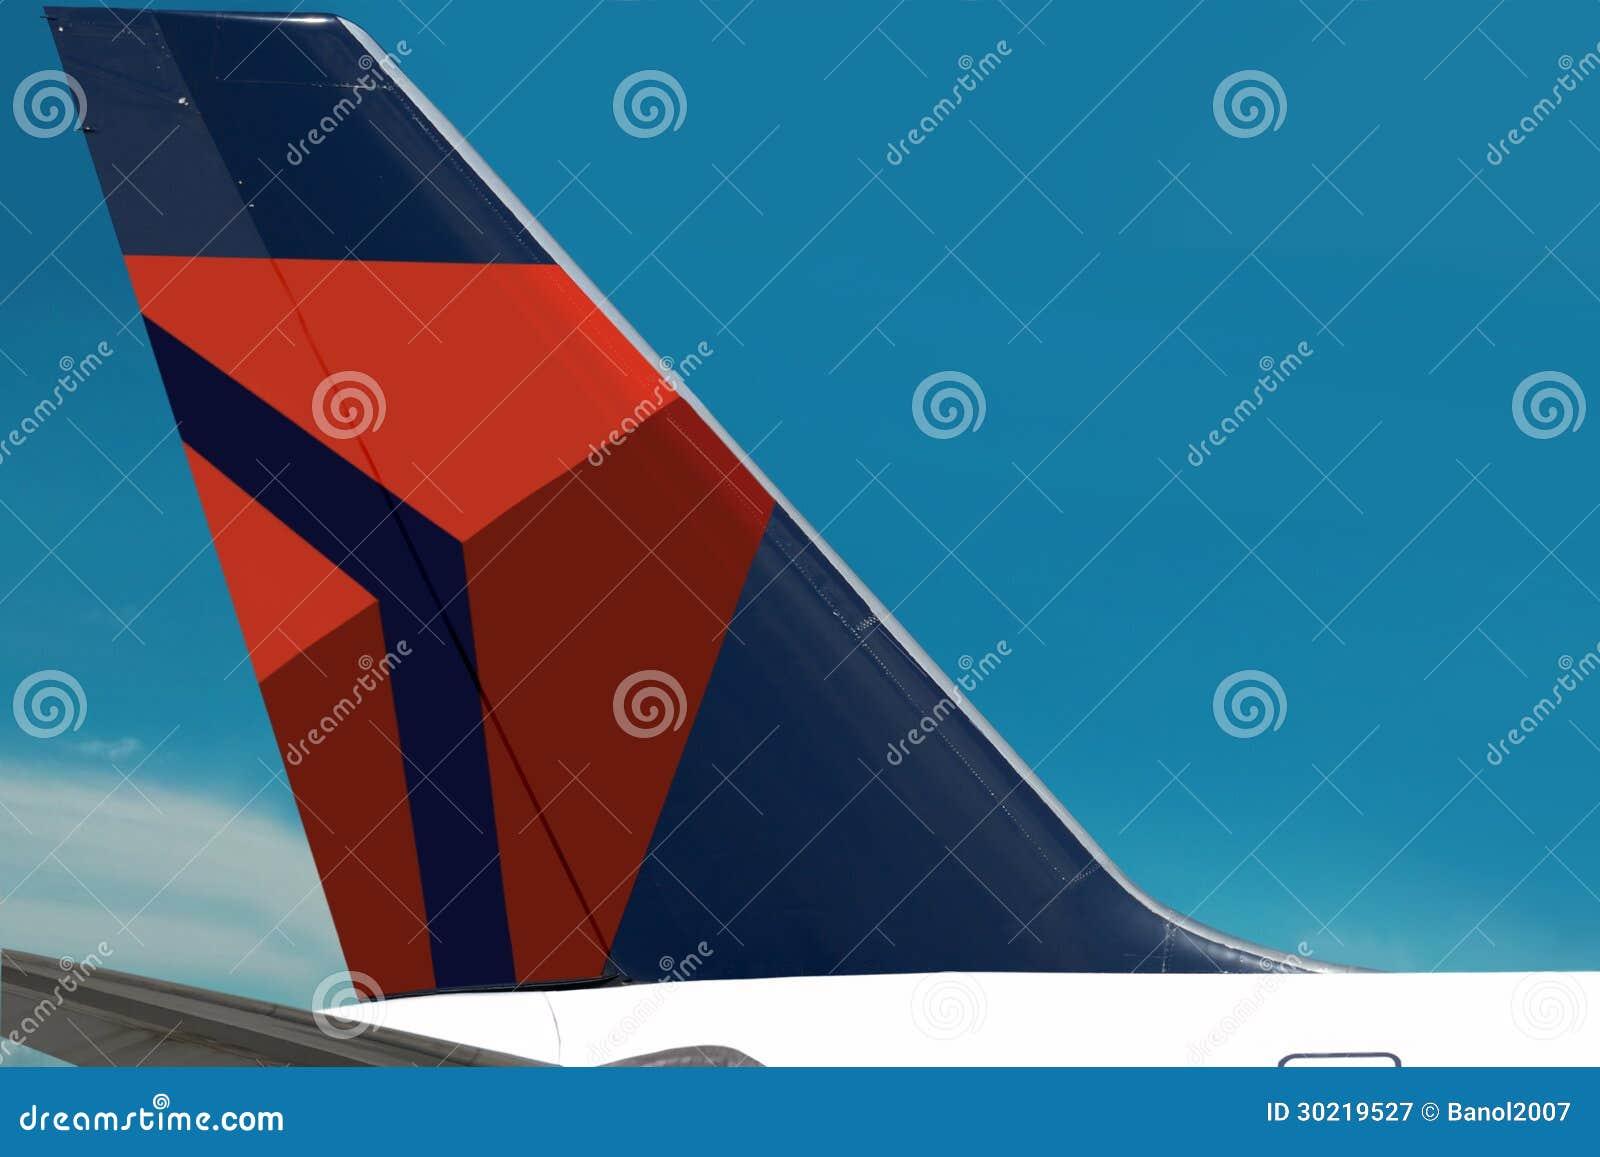 Delta air lines logo plain sky editorial photography image of delta air lines logo plain sky editorial stock photo biocorpaavc Choice Image